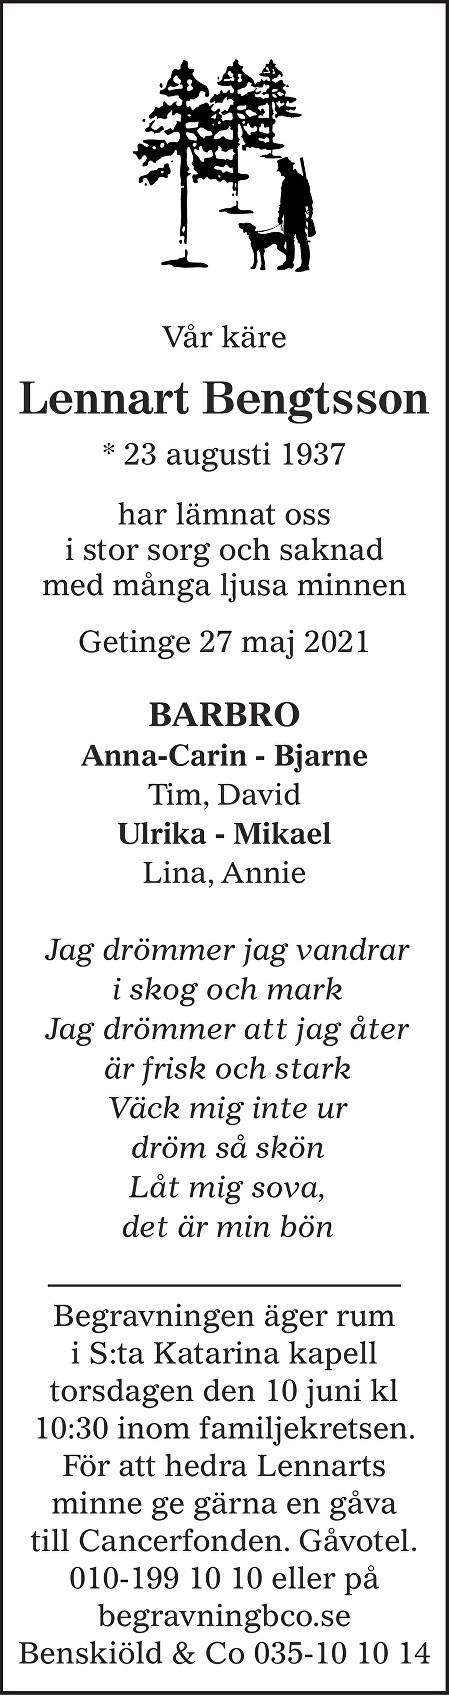 Lennart Bengtsson Death notice